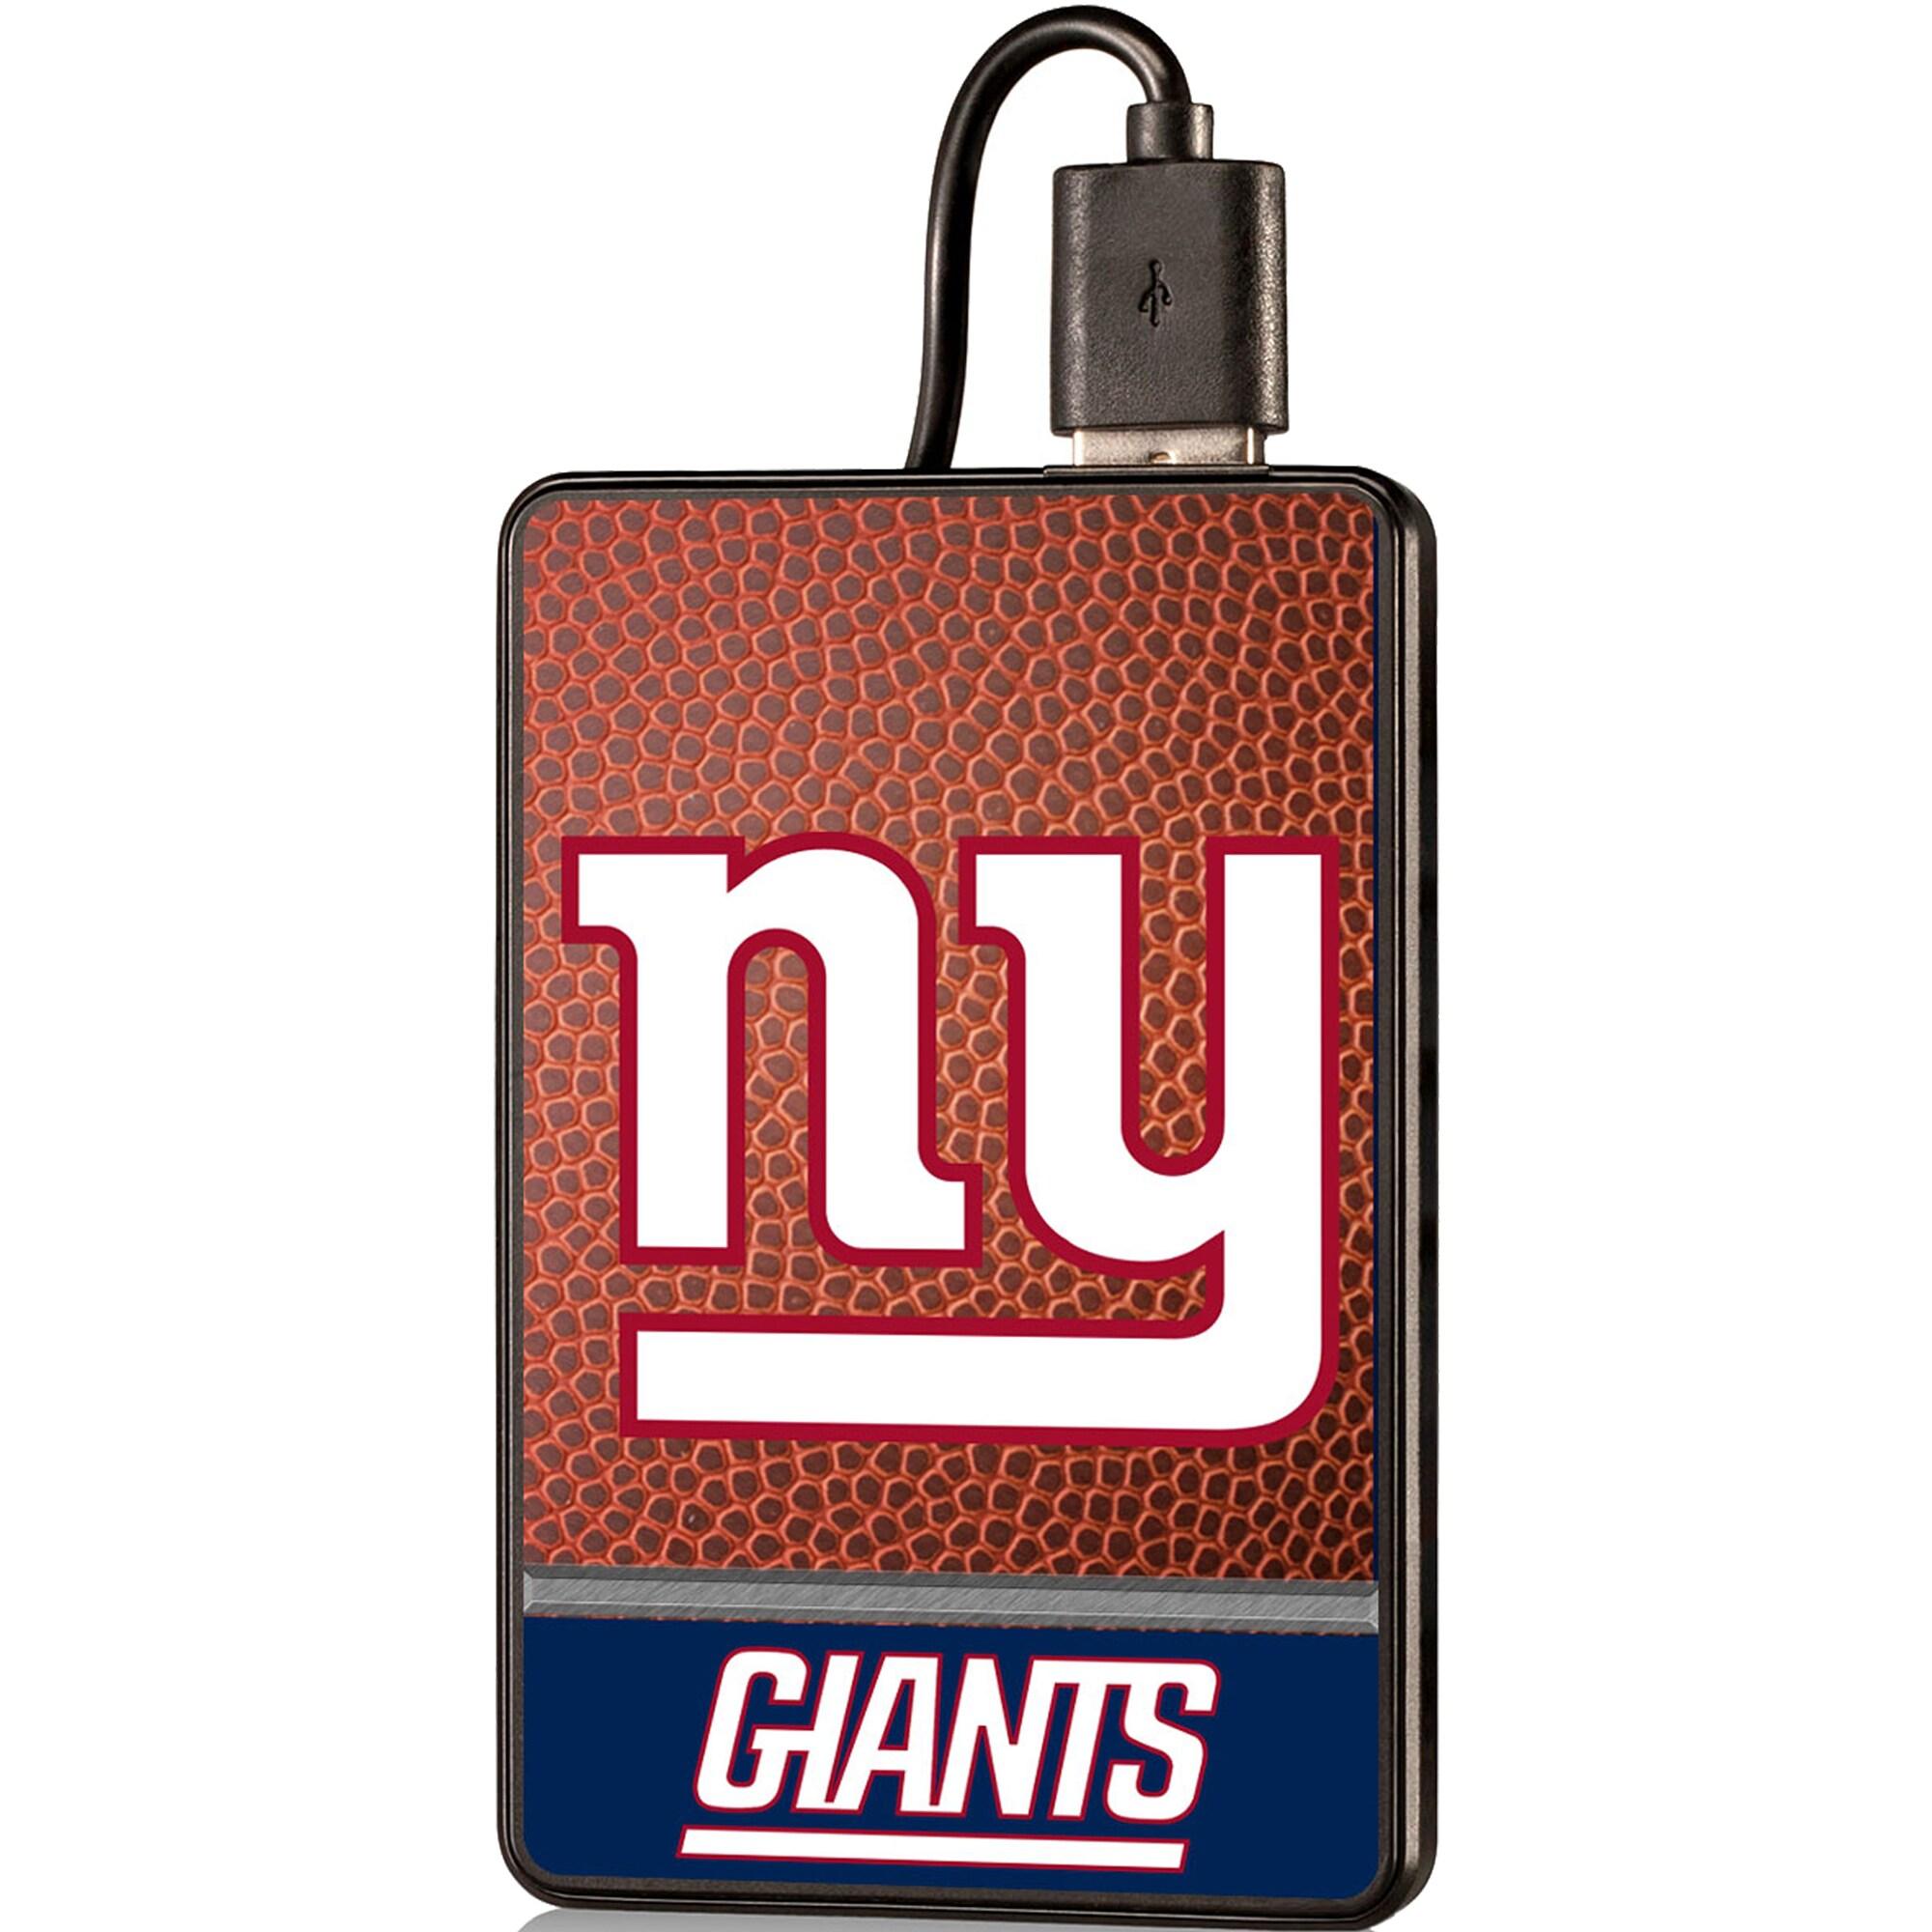 New York Giants 2000 mAh Credit Card Powerbank